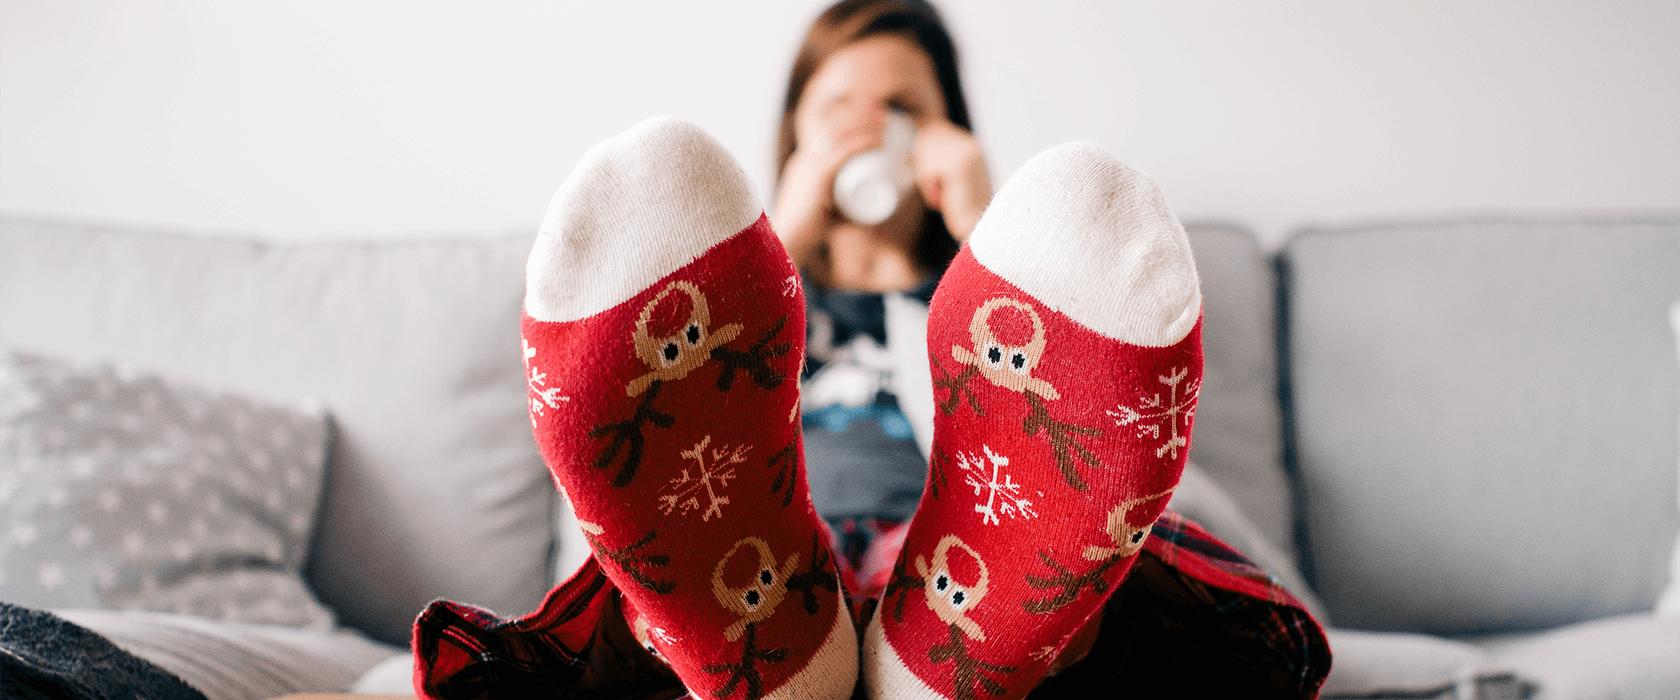 una chica lleva calcetines de Happy Socks